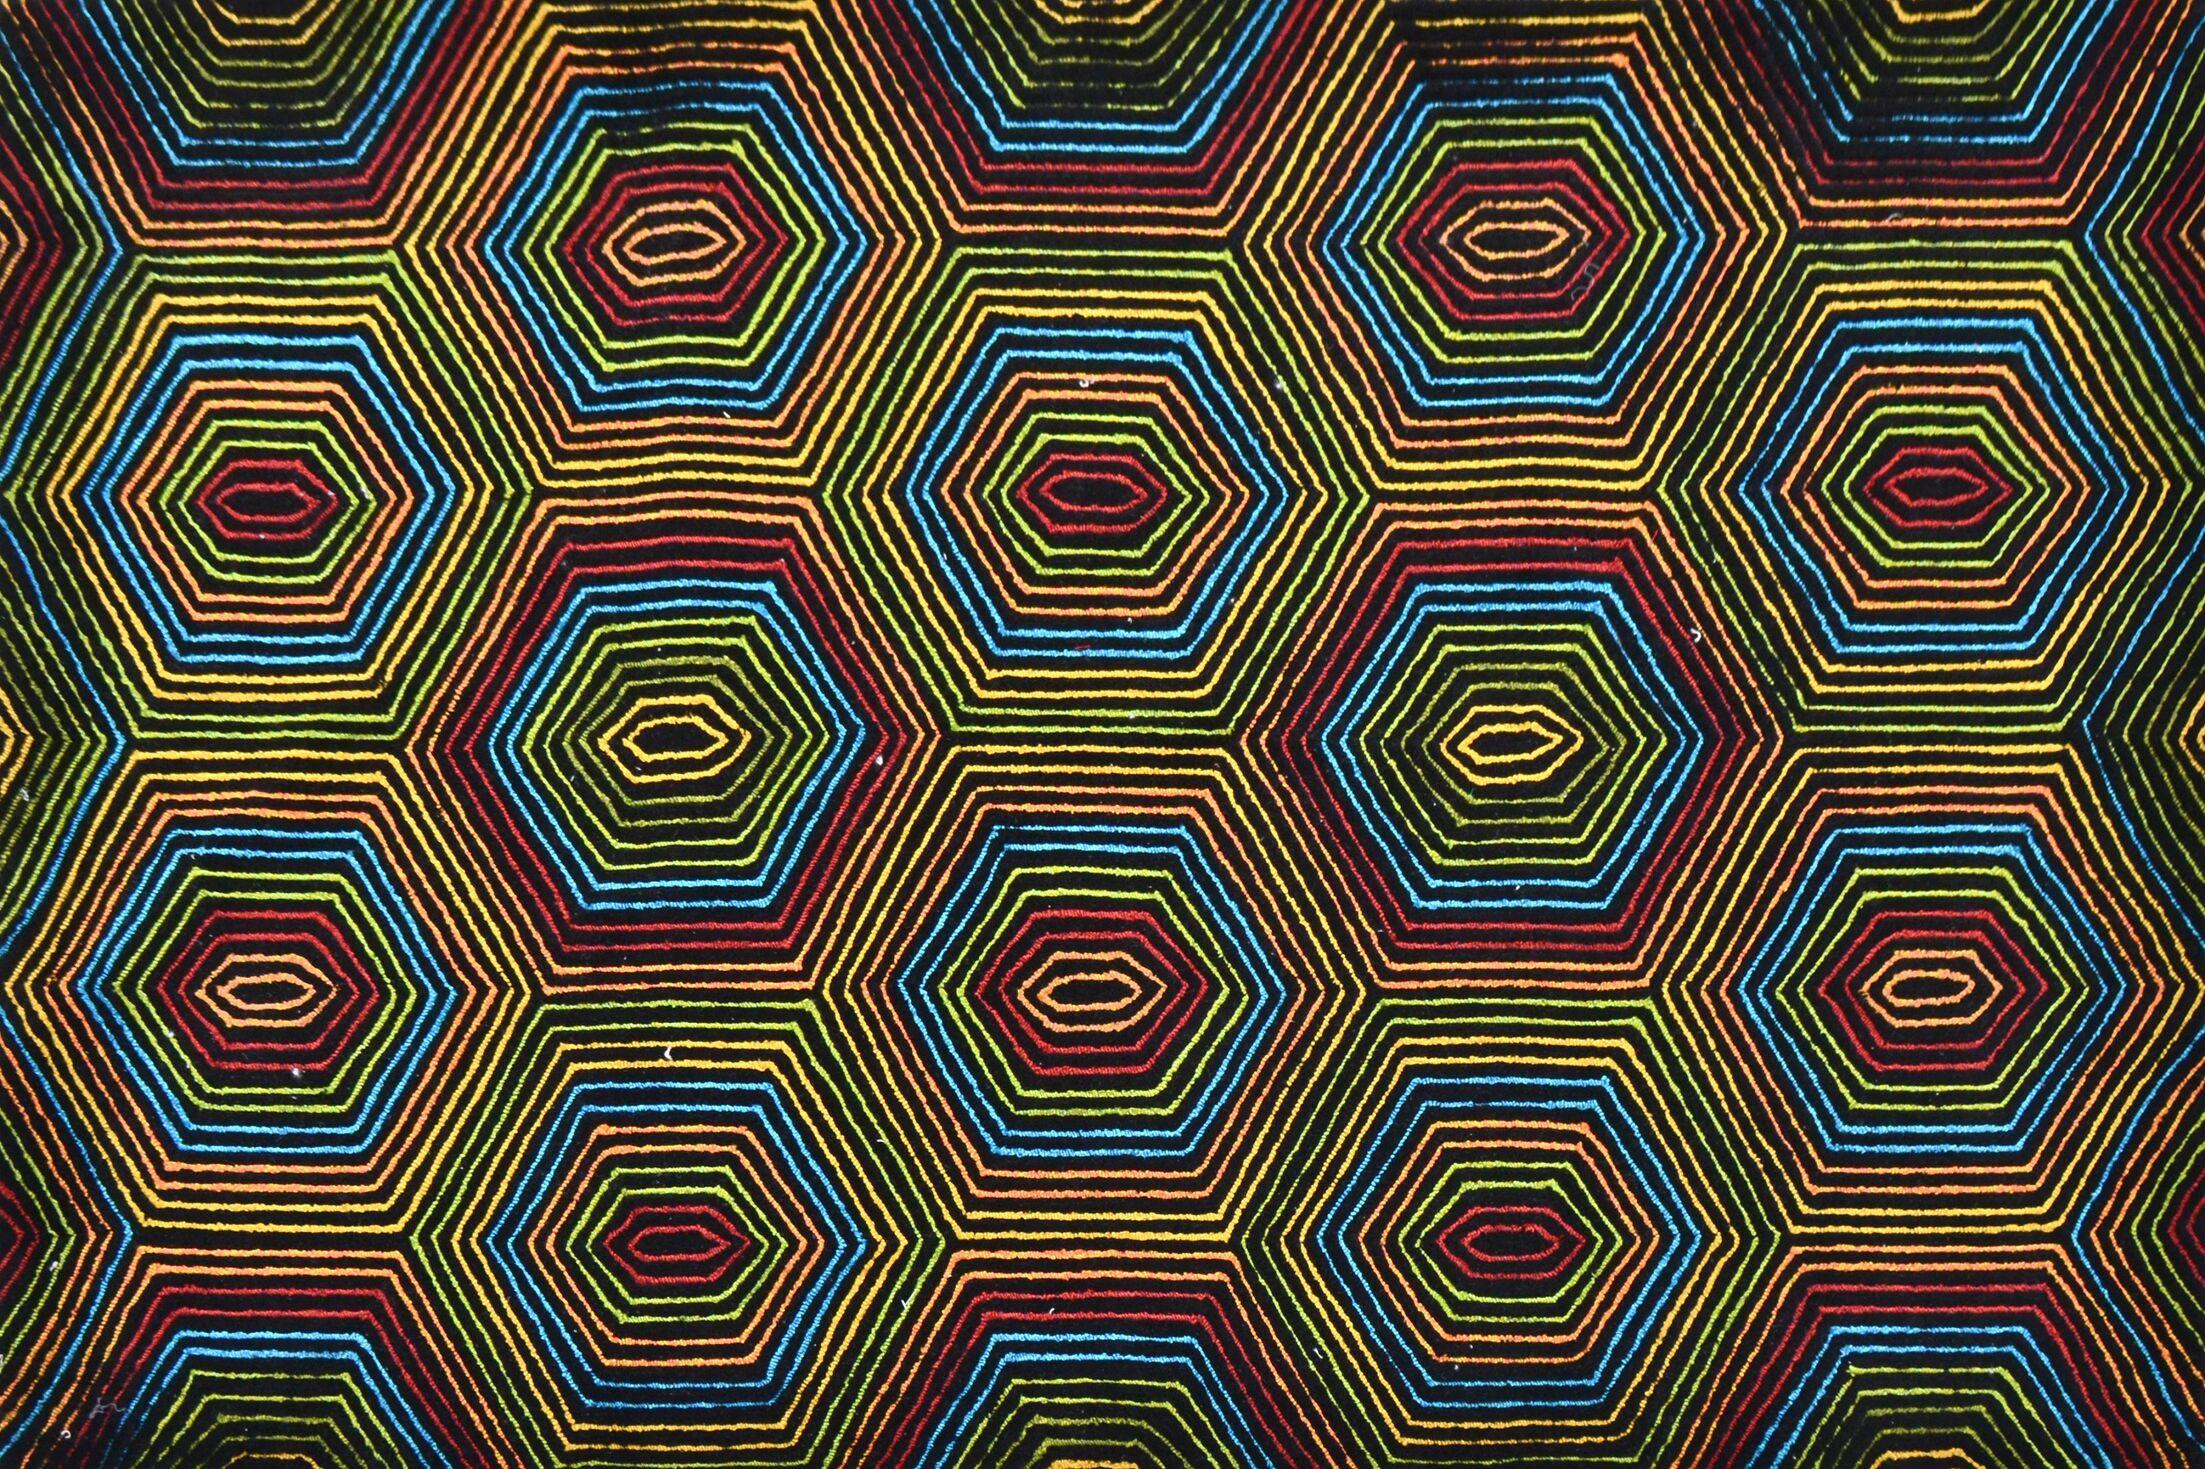 Handmade Area Rug Rug Size: 8' x 10'